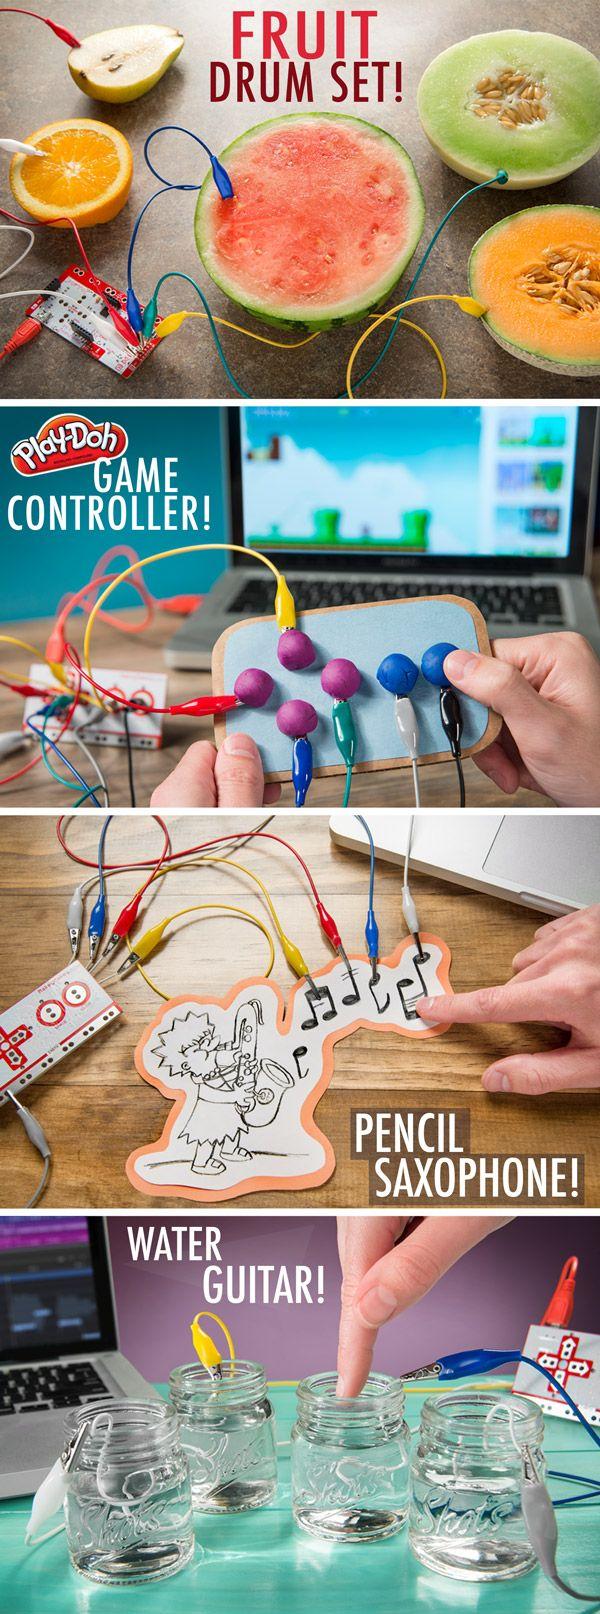 Make Makey: Make everyday objects do amazing things.